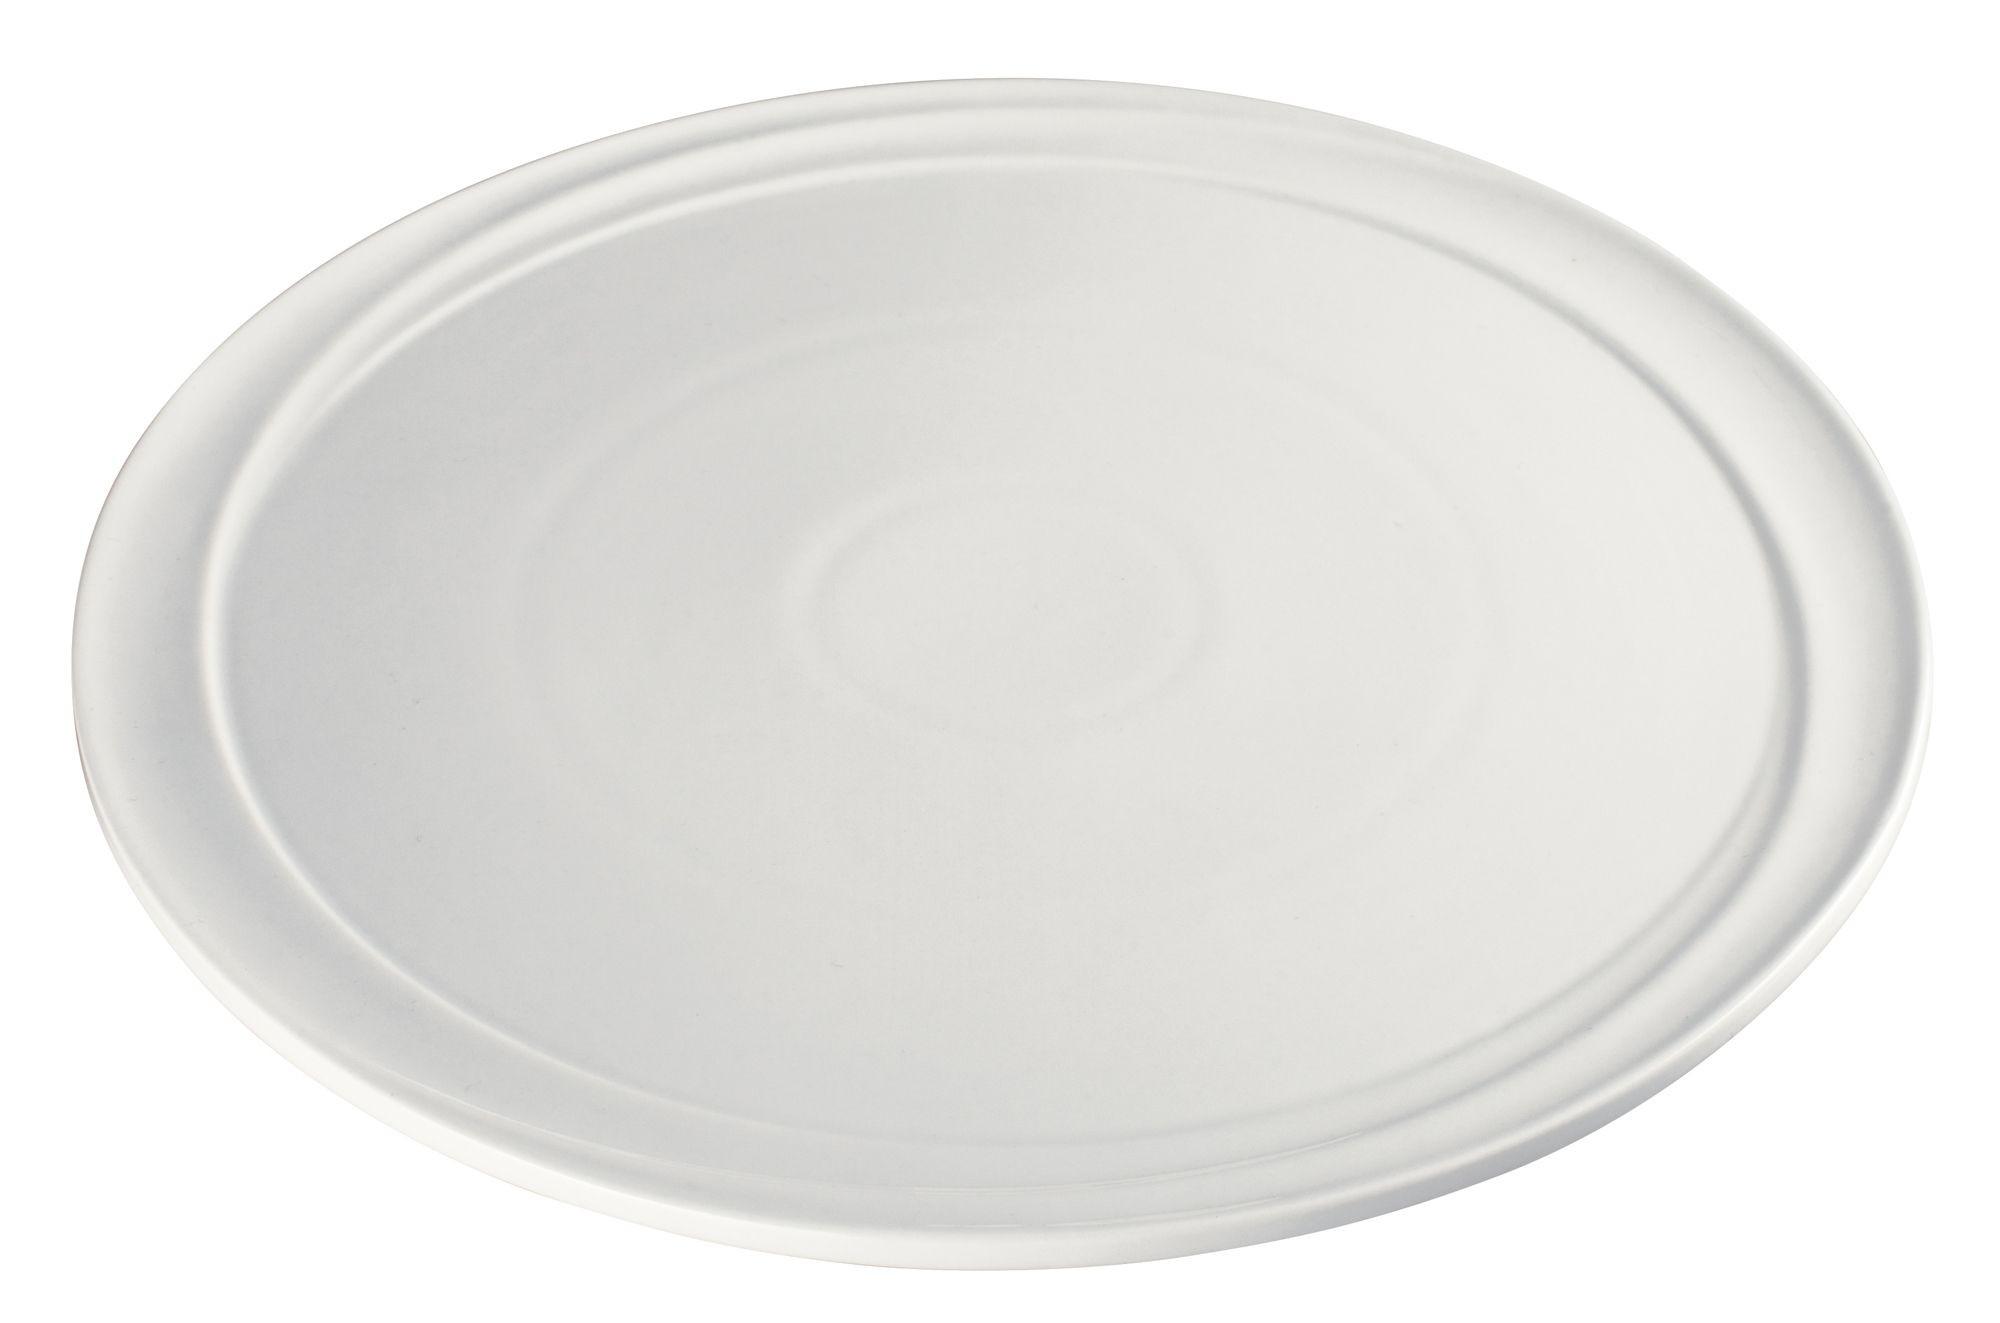 "Winco WDP007-102 Mazzari Creamy White Porcelain Round Platter 11"""